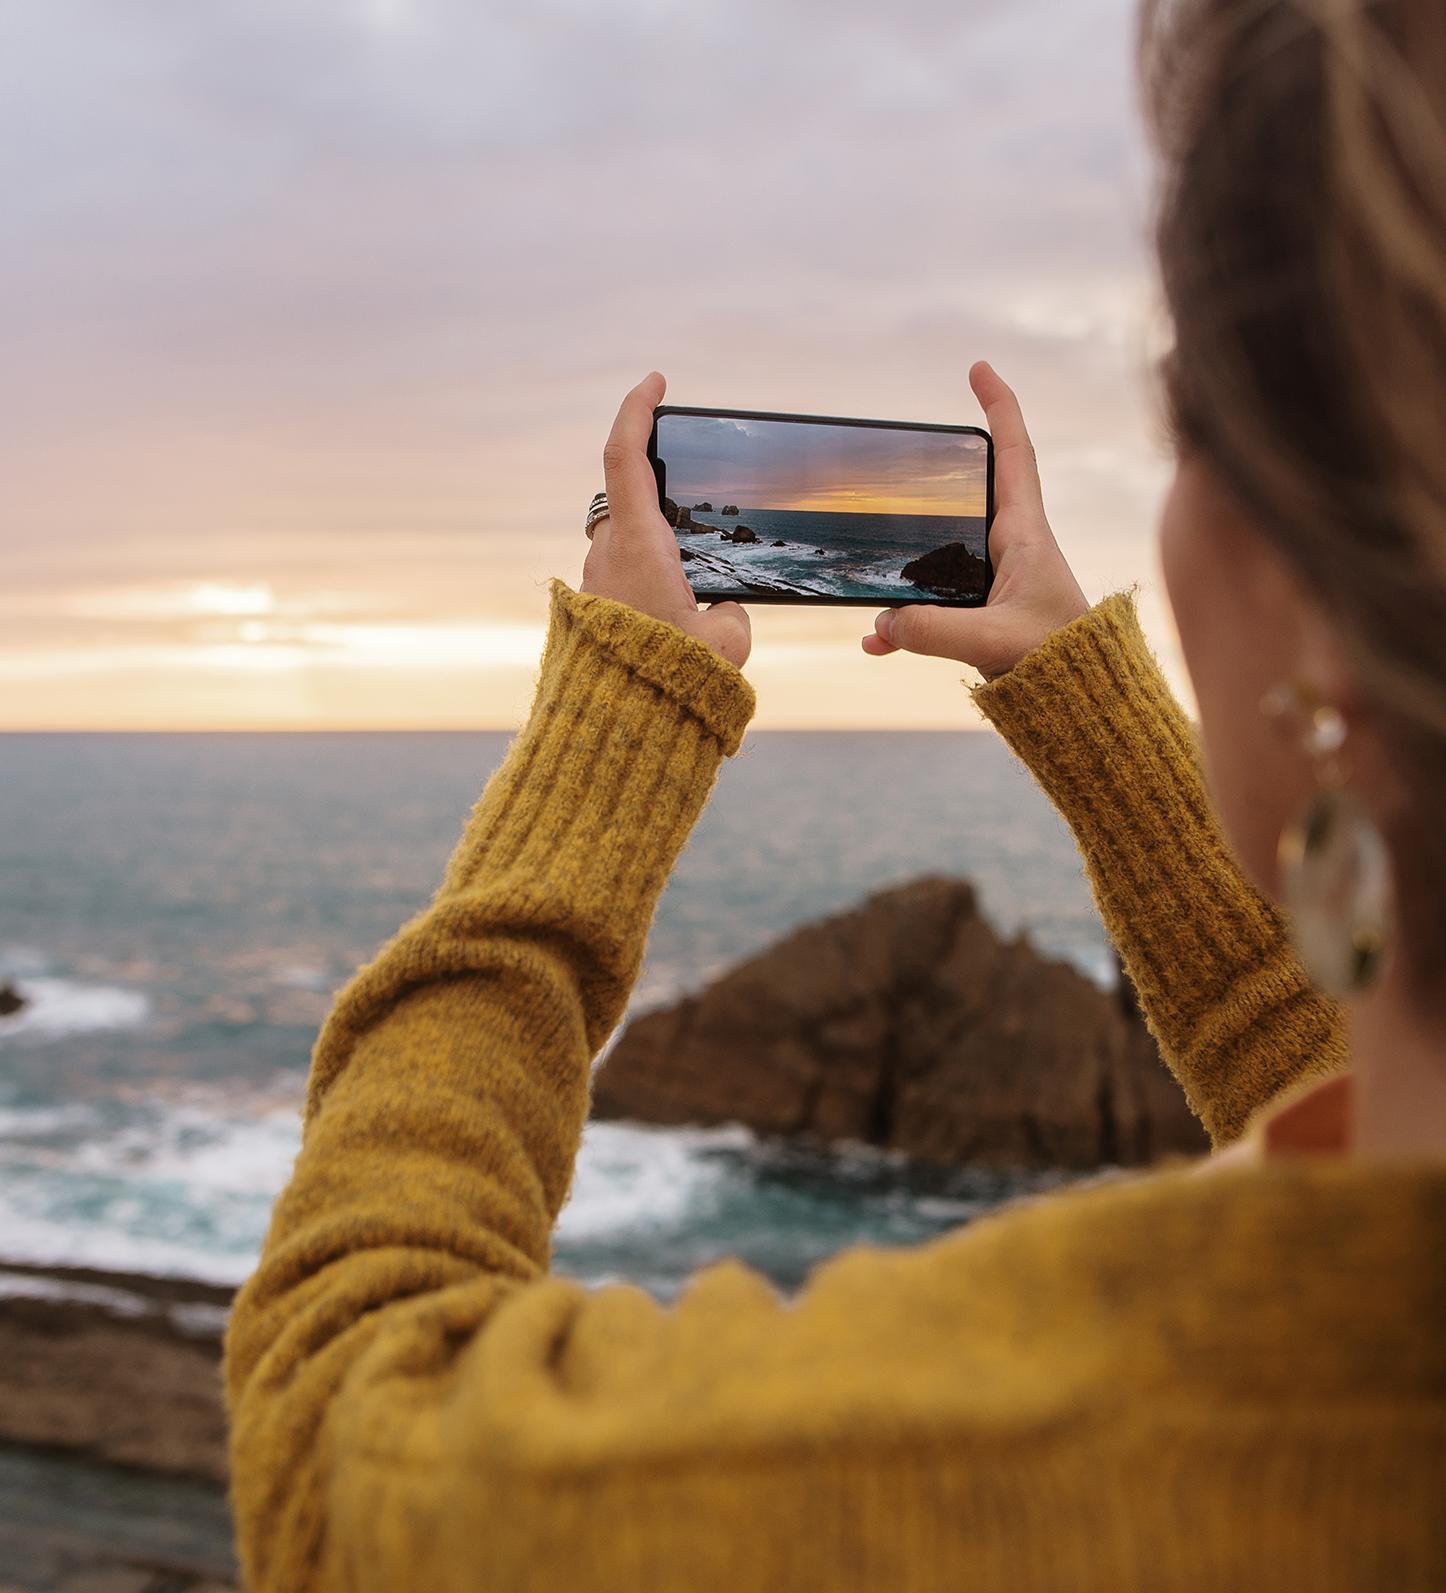 XiaomiMi-11: Video